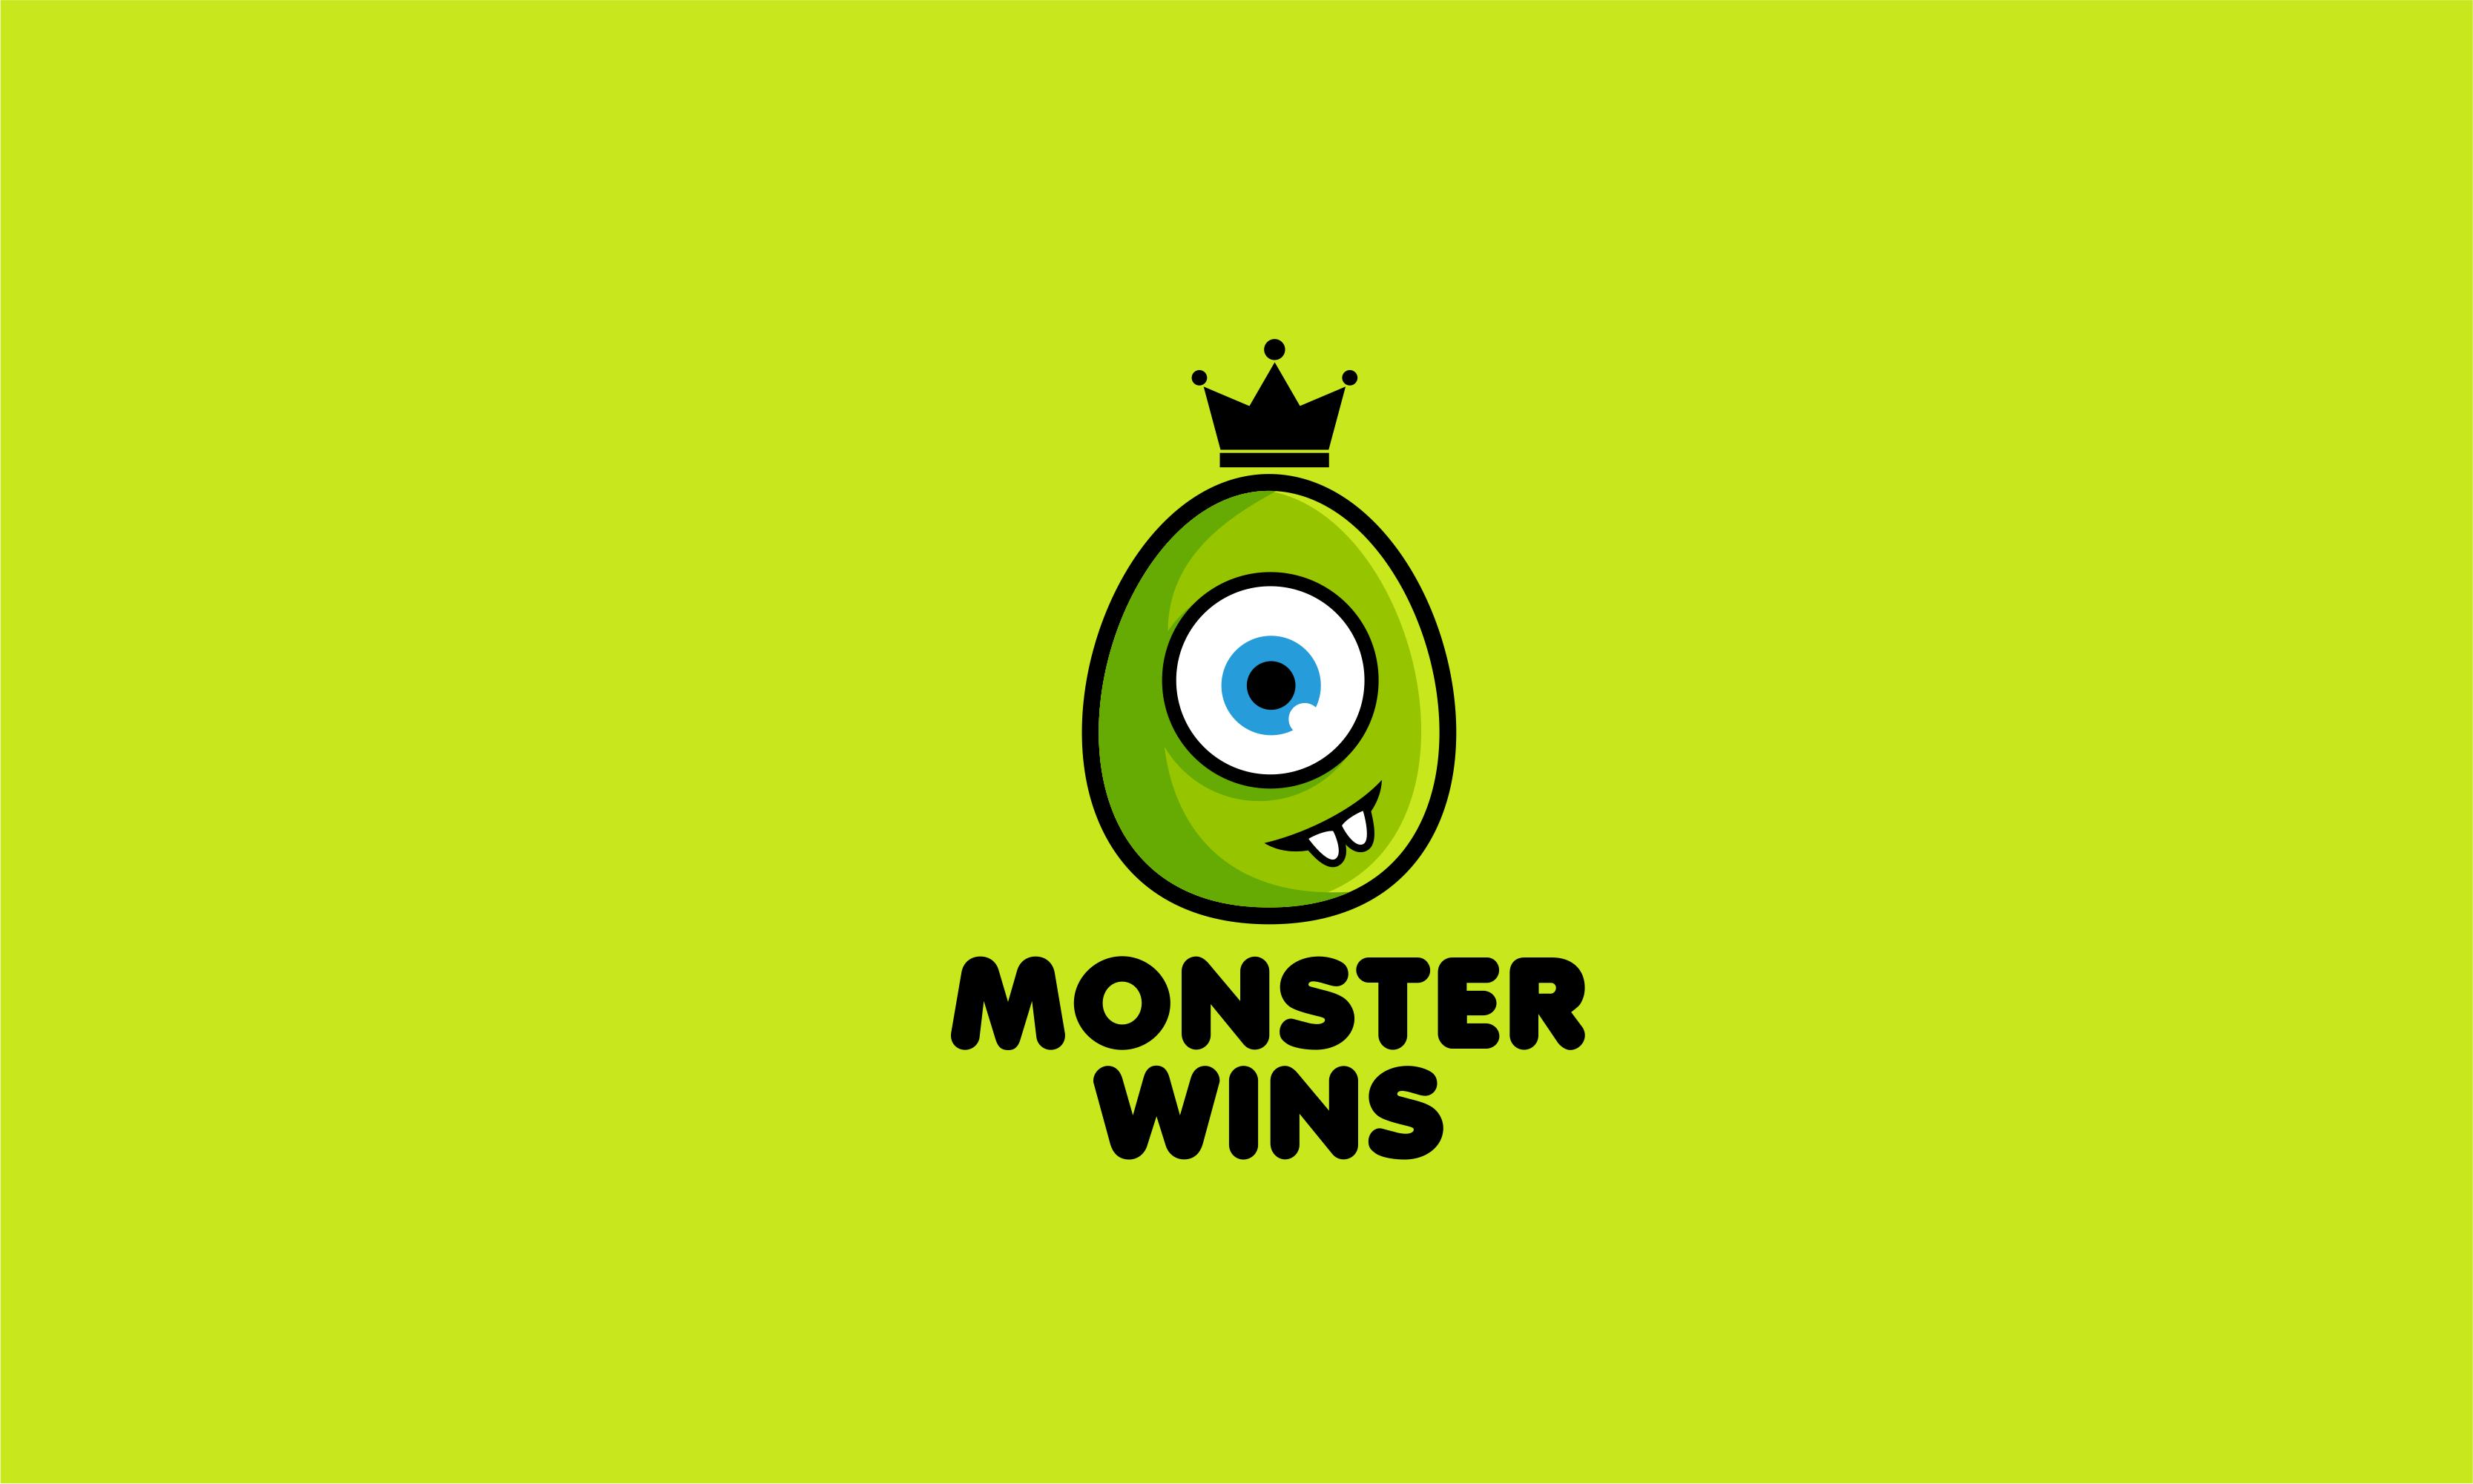 Monsterwins